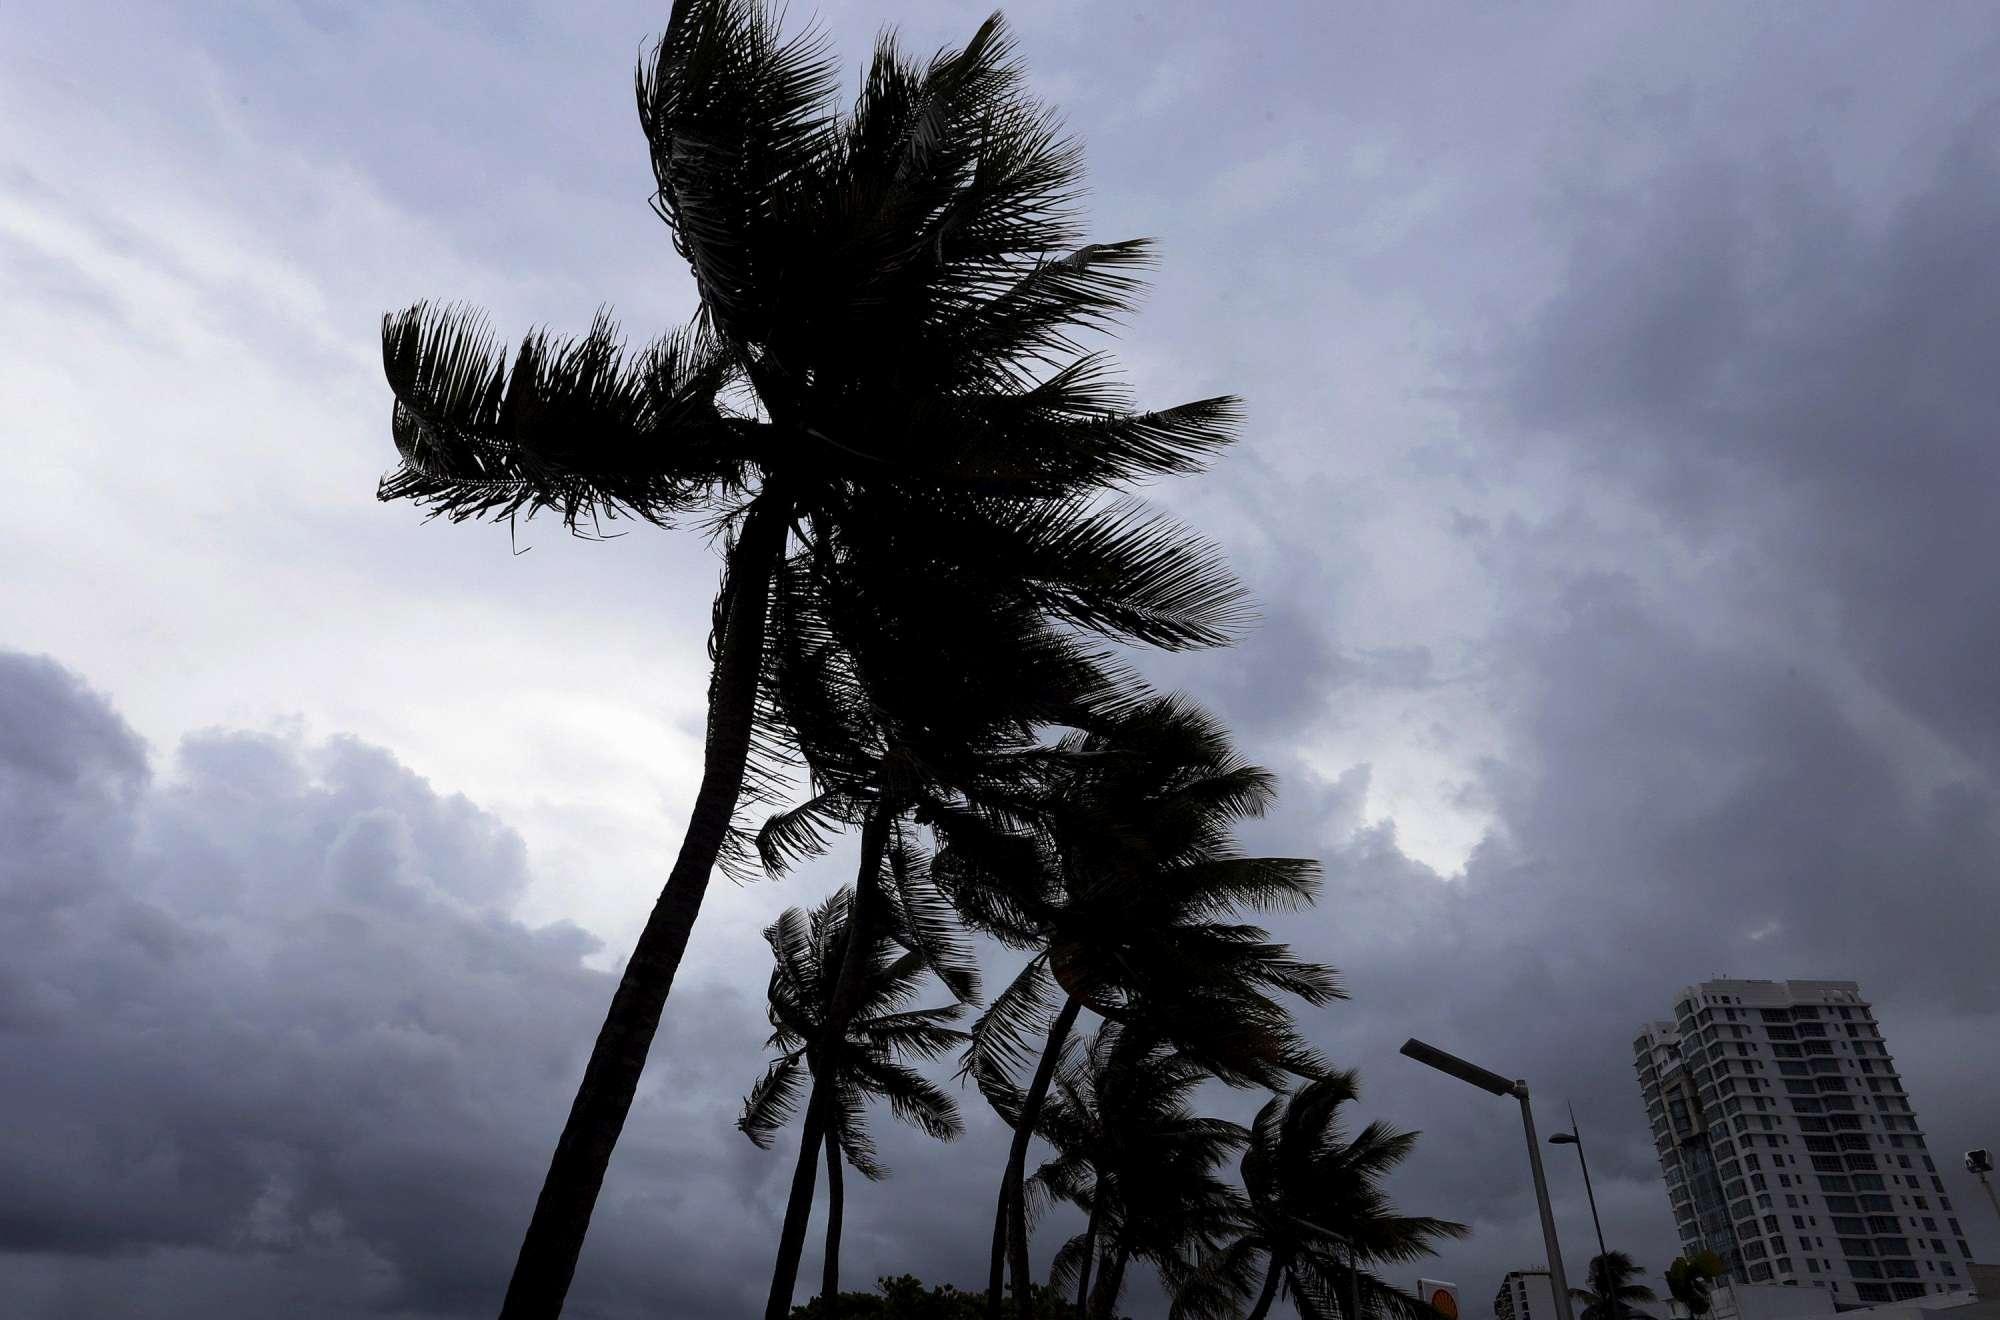 L uragano Irma minaccia Bahamas, Antille e Stati Uniti